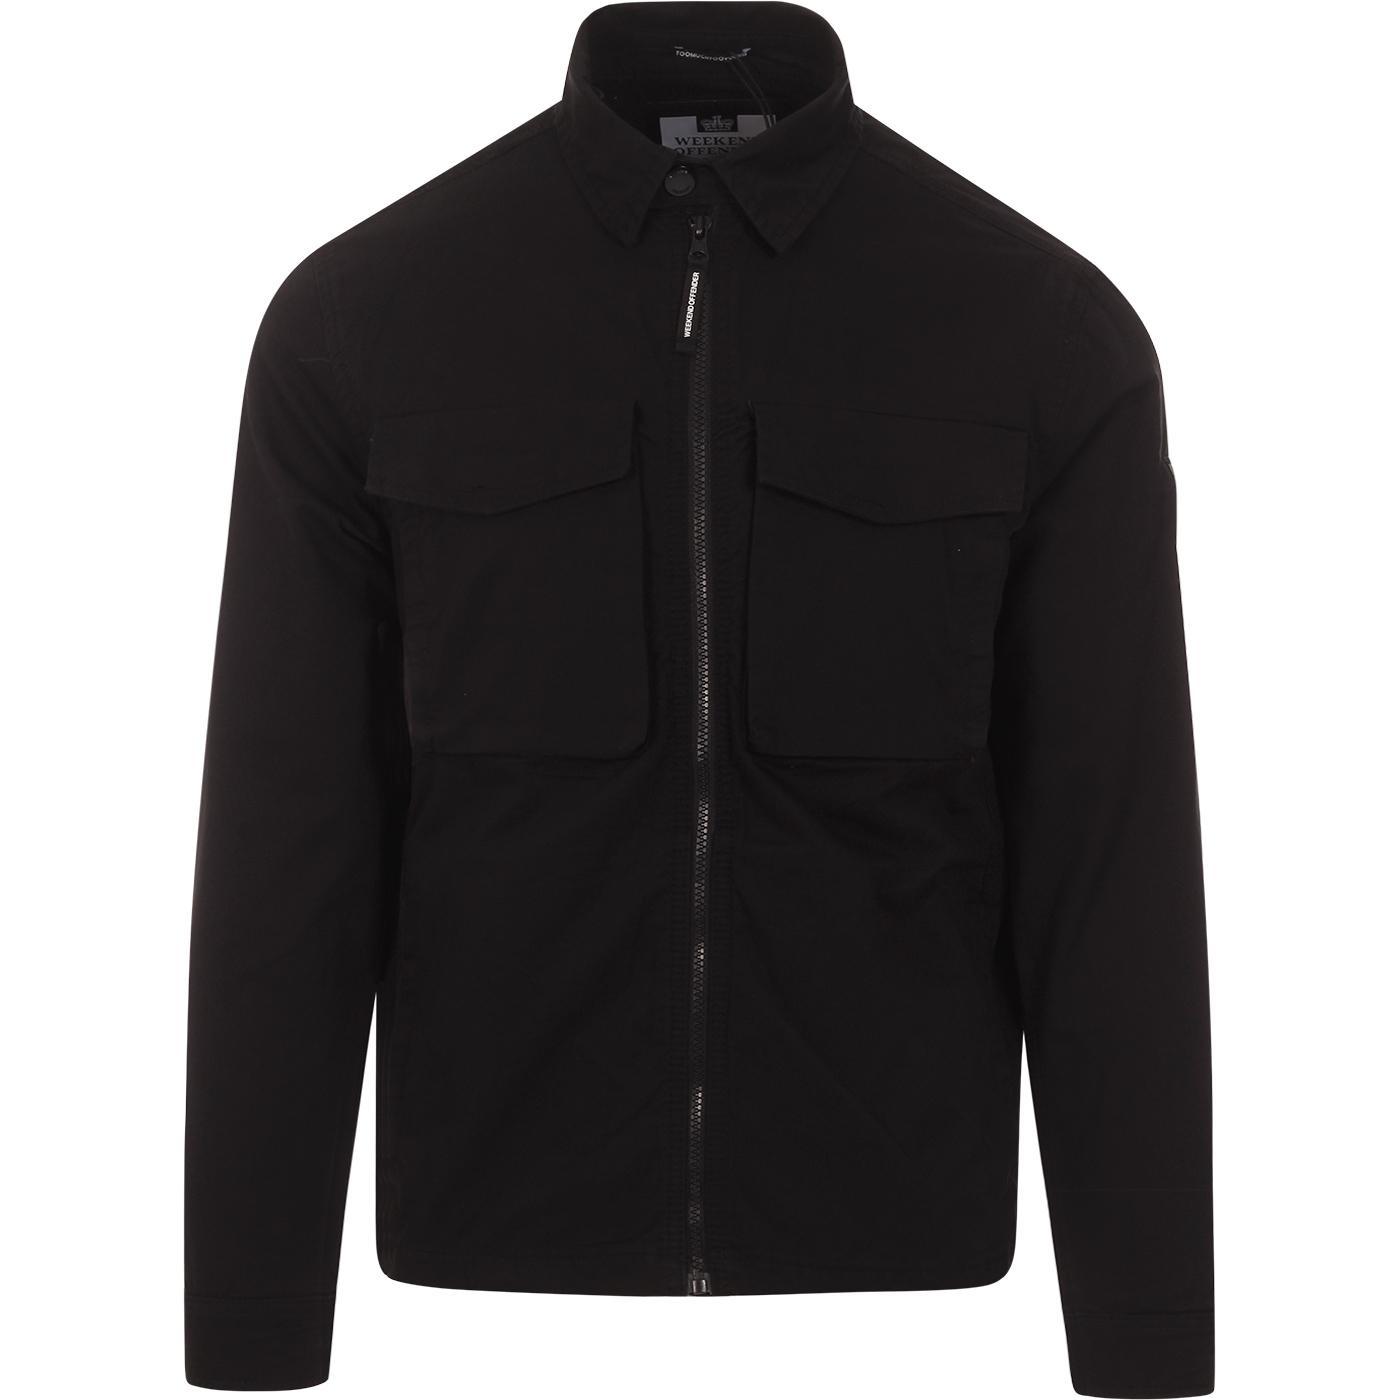 Pileggi WEEKEND OFFENDER Military Shirt Jacket (B)